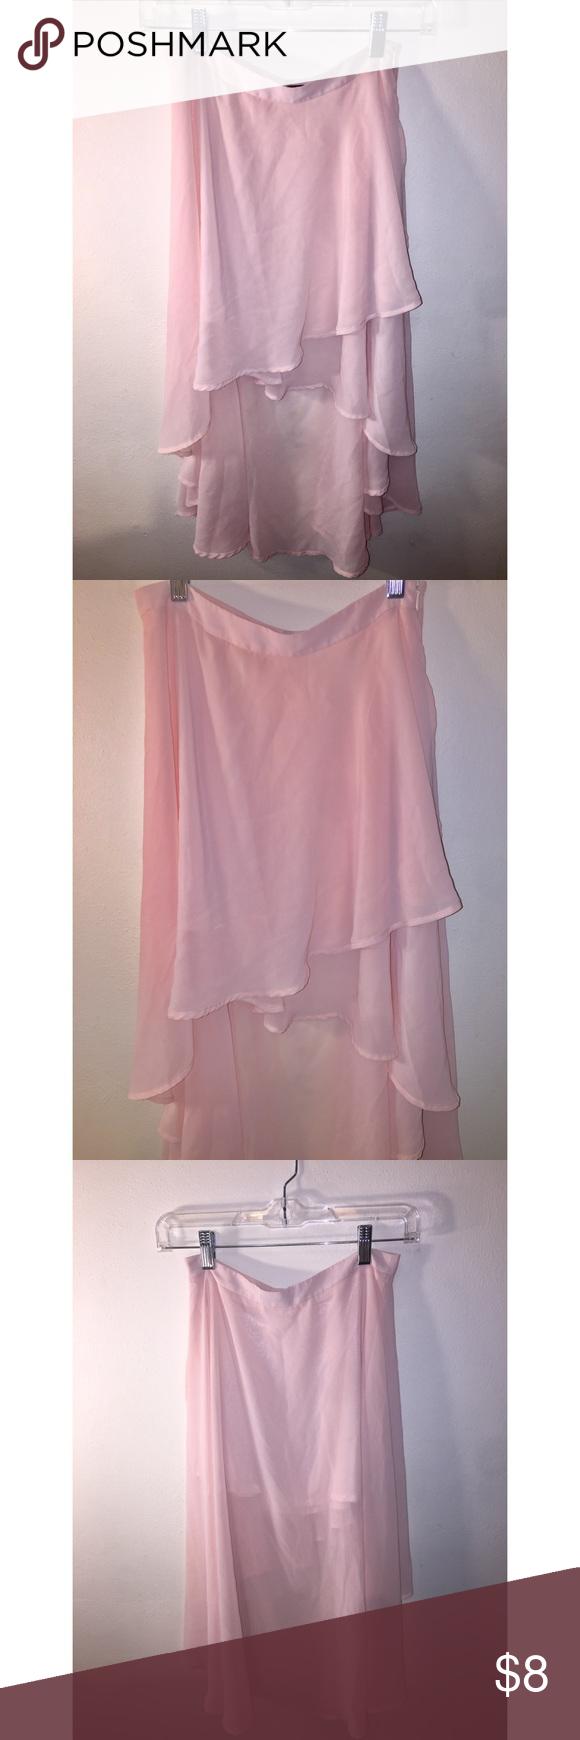 Forever 21 - Light pink high-low skirt Adorable skirt! Soft pink color. & Forever 21 - Light pink high-low skirt Adorable skirt! Soft pink ... azcodes.com